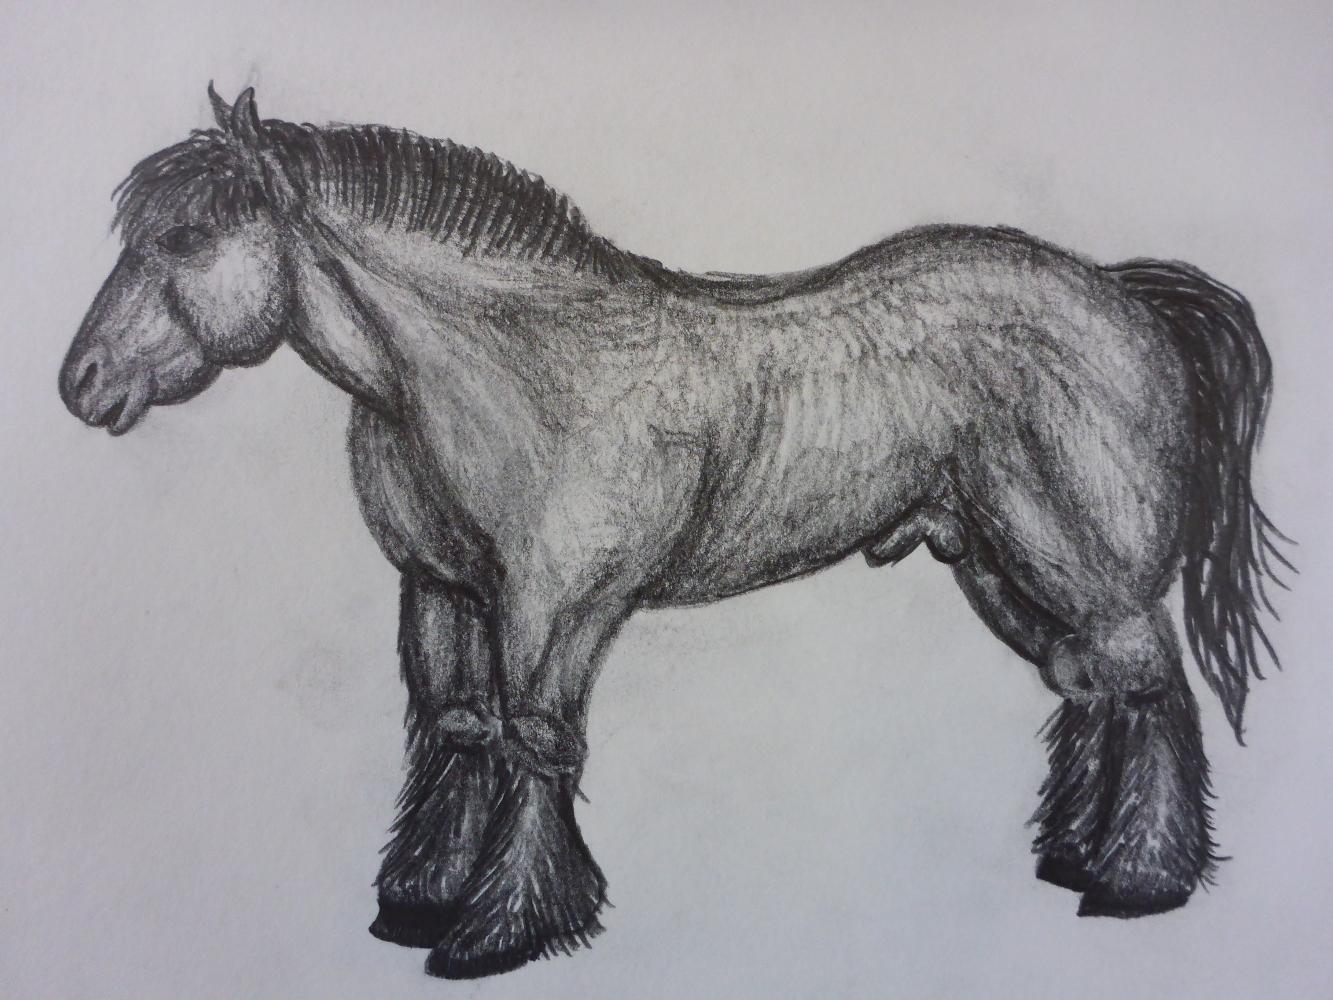 """Stallion II"", 2018, pencil on paper, 30 x 21 cm"